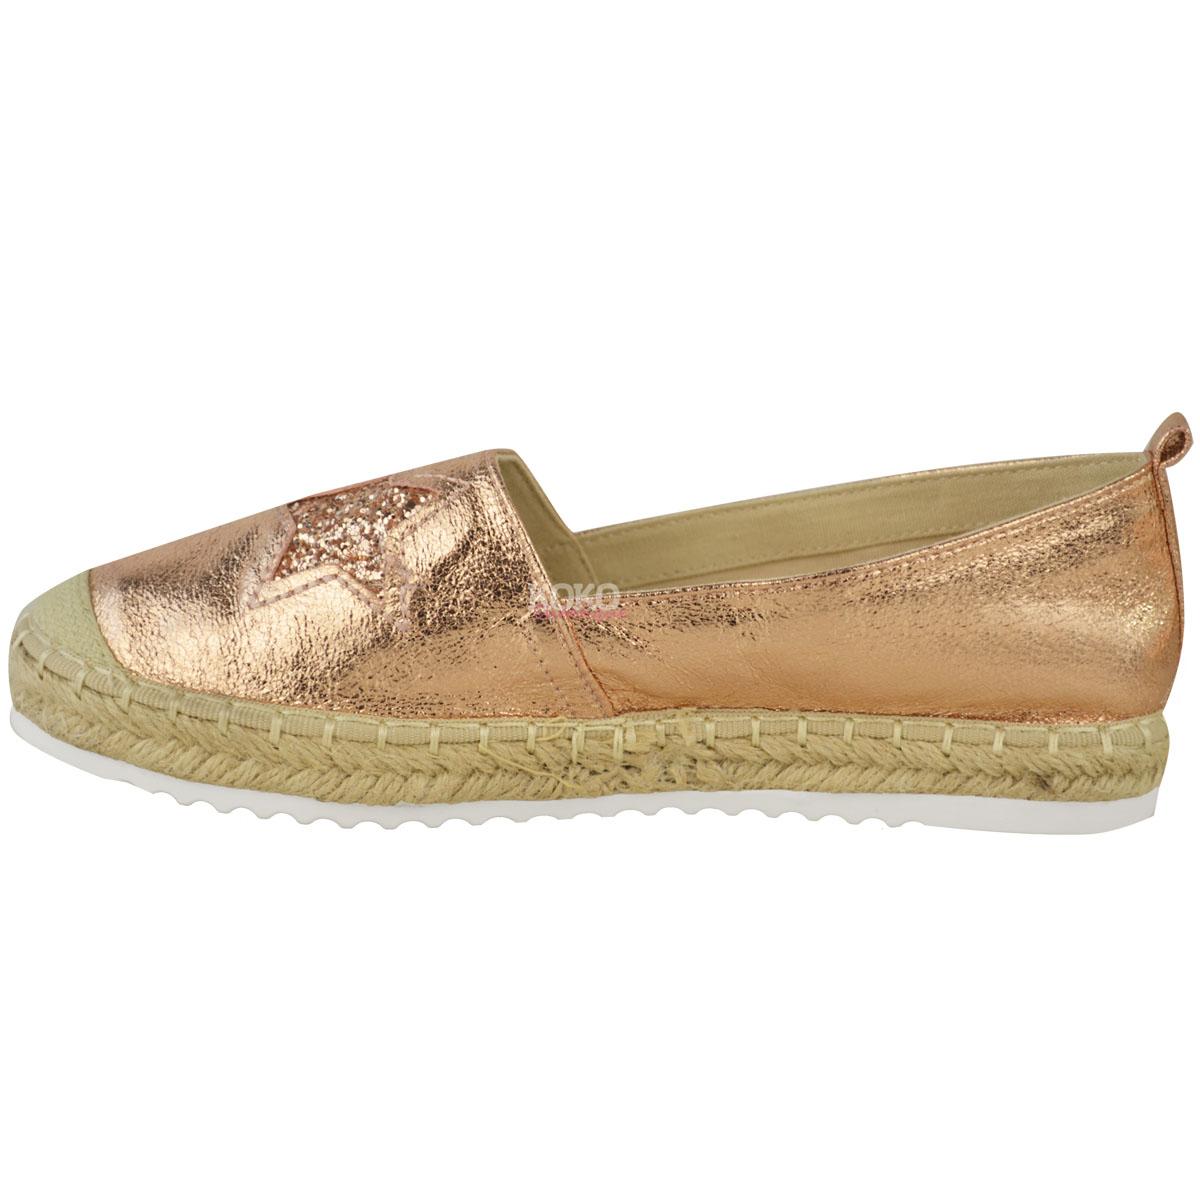 Womens Ladies Rose Gold Flat Espadrille Shoes Sandals ...